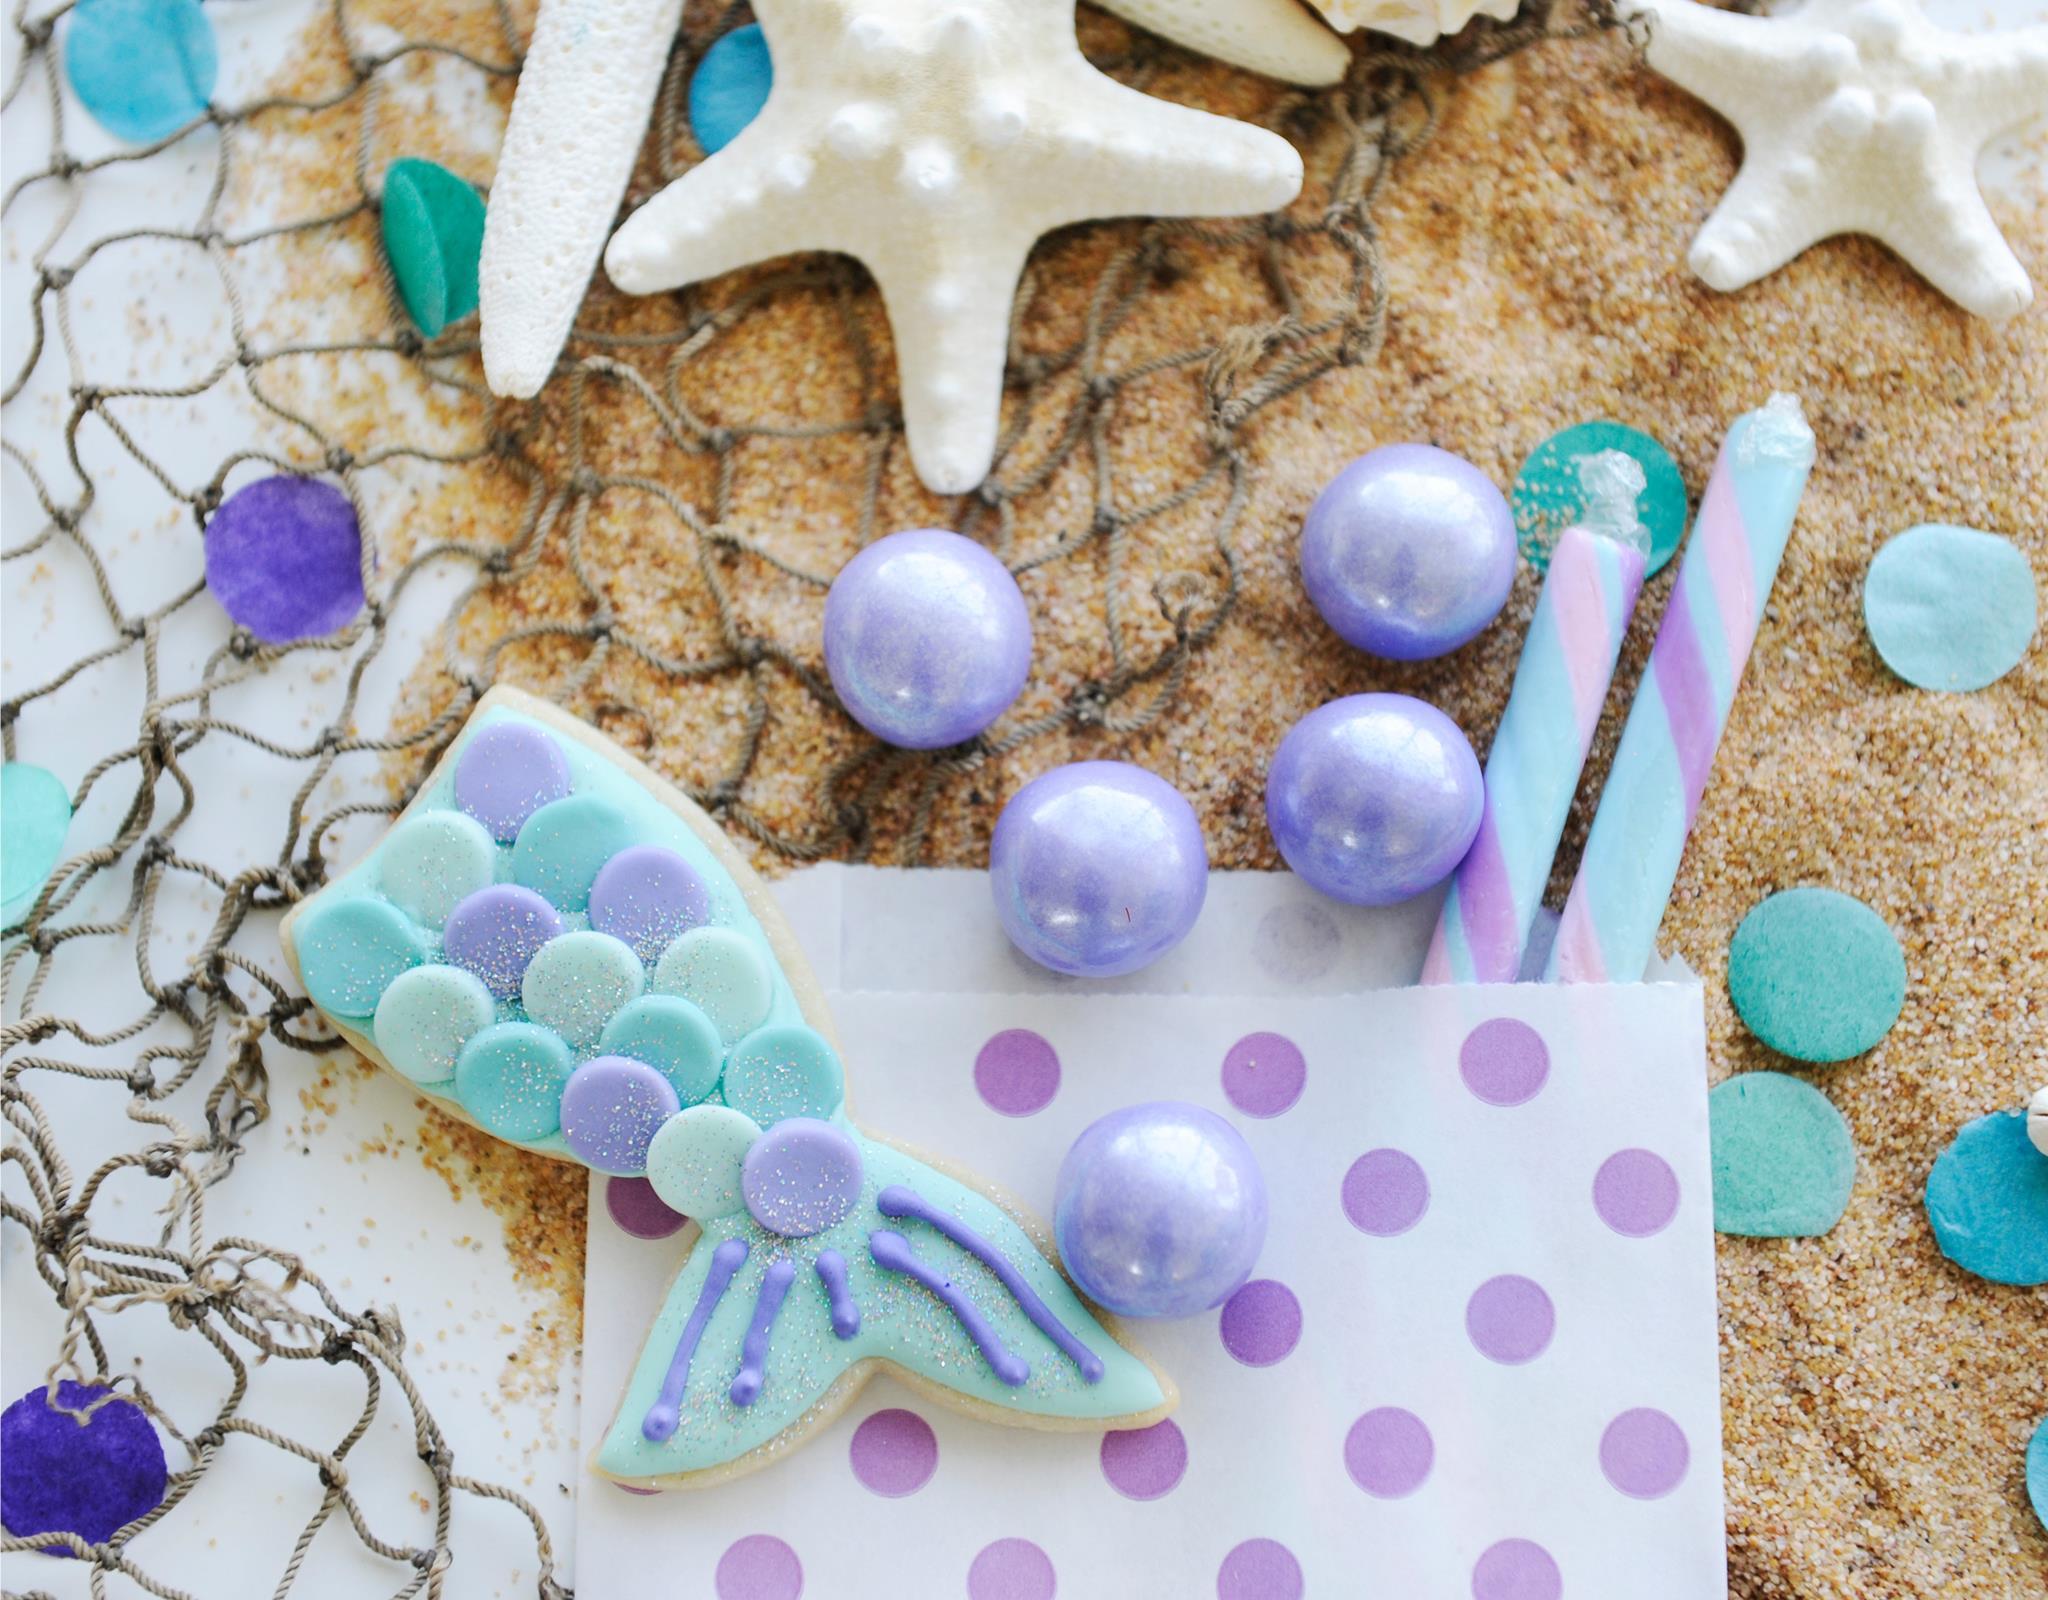 Mermaid Party Ideas - Project Nursery